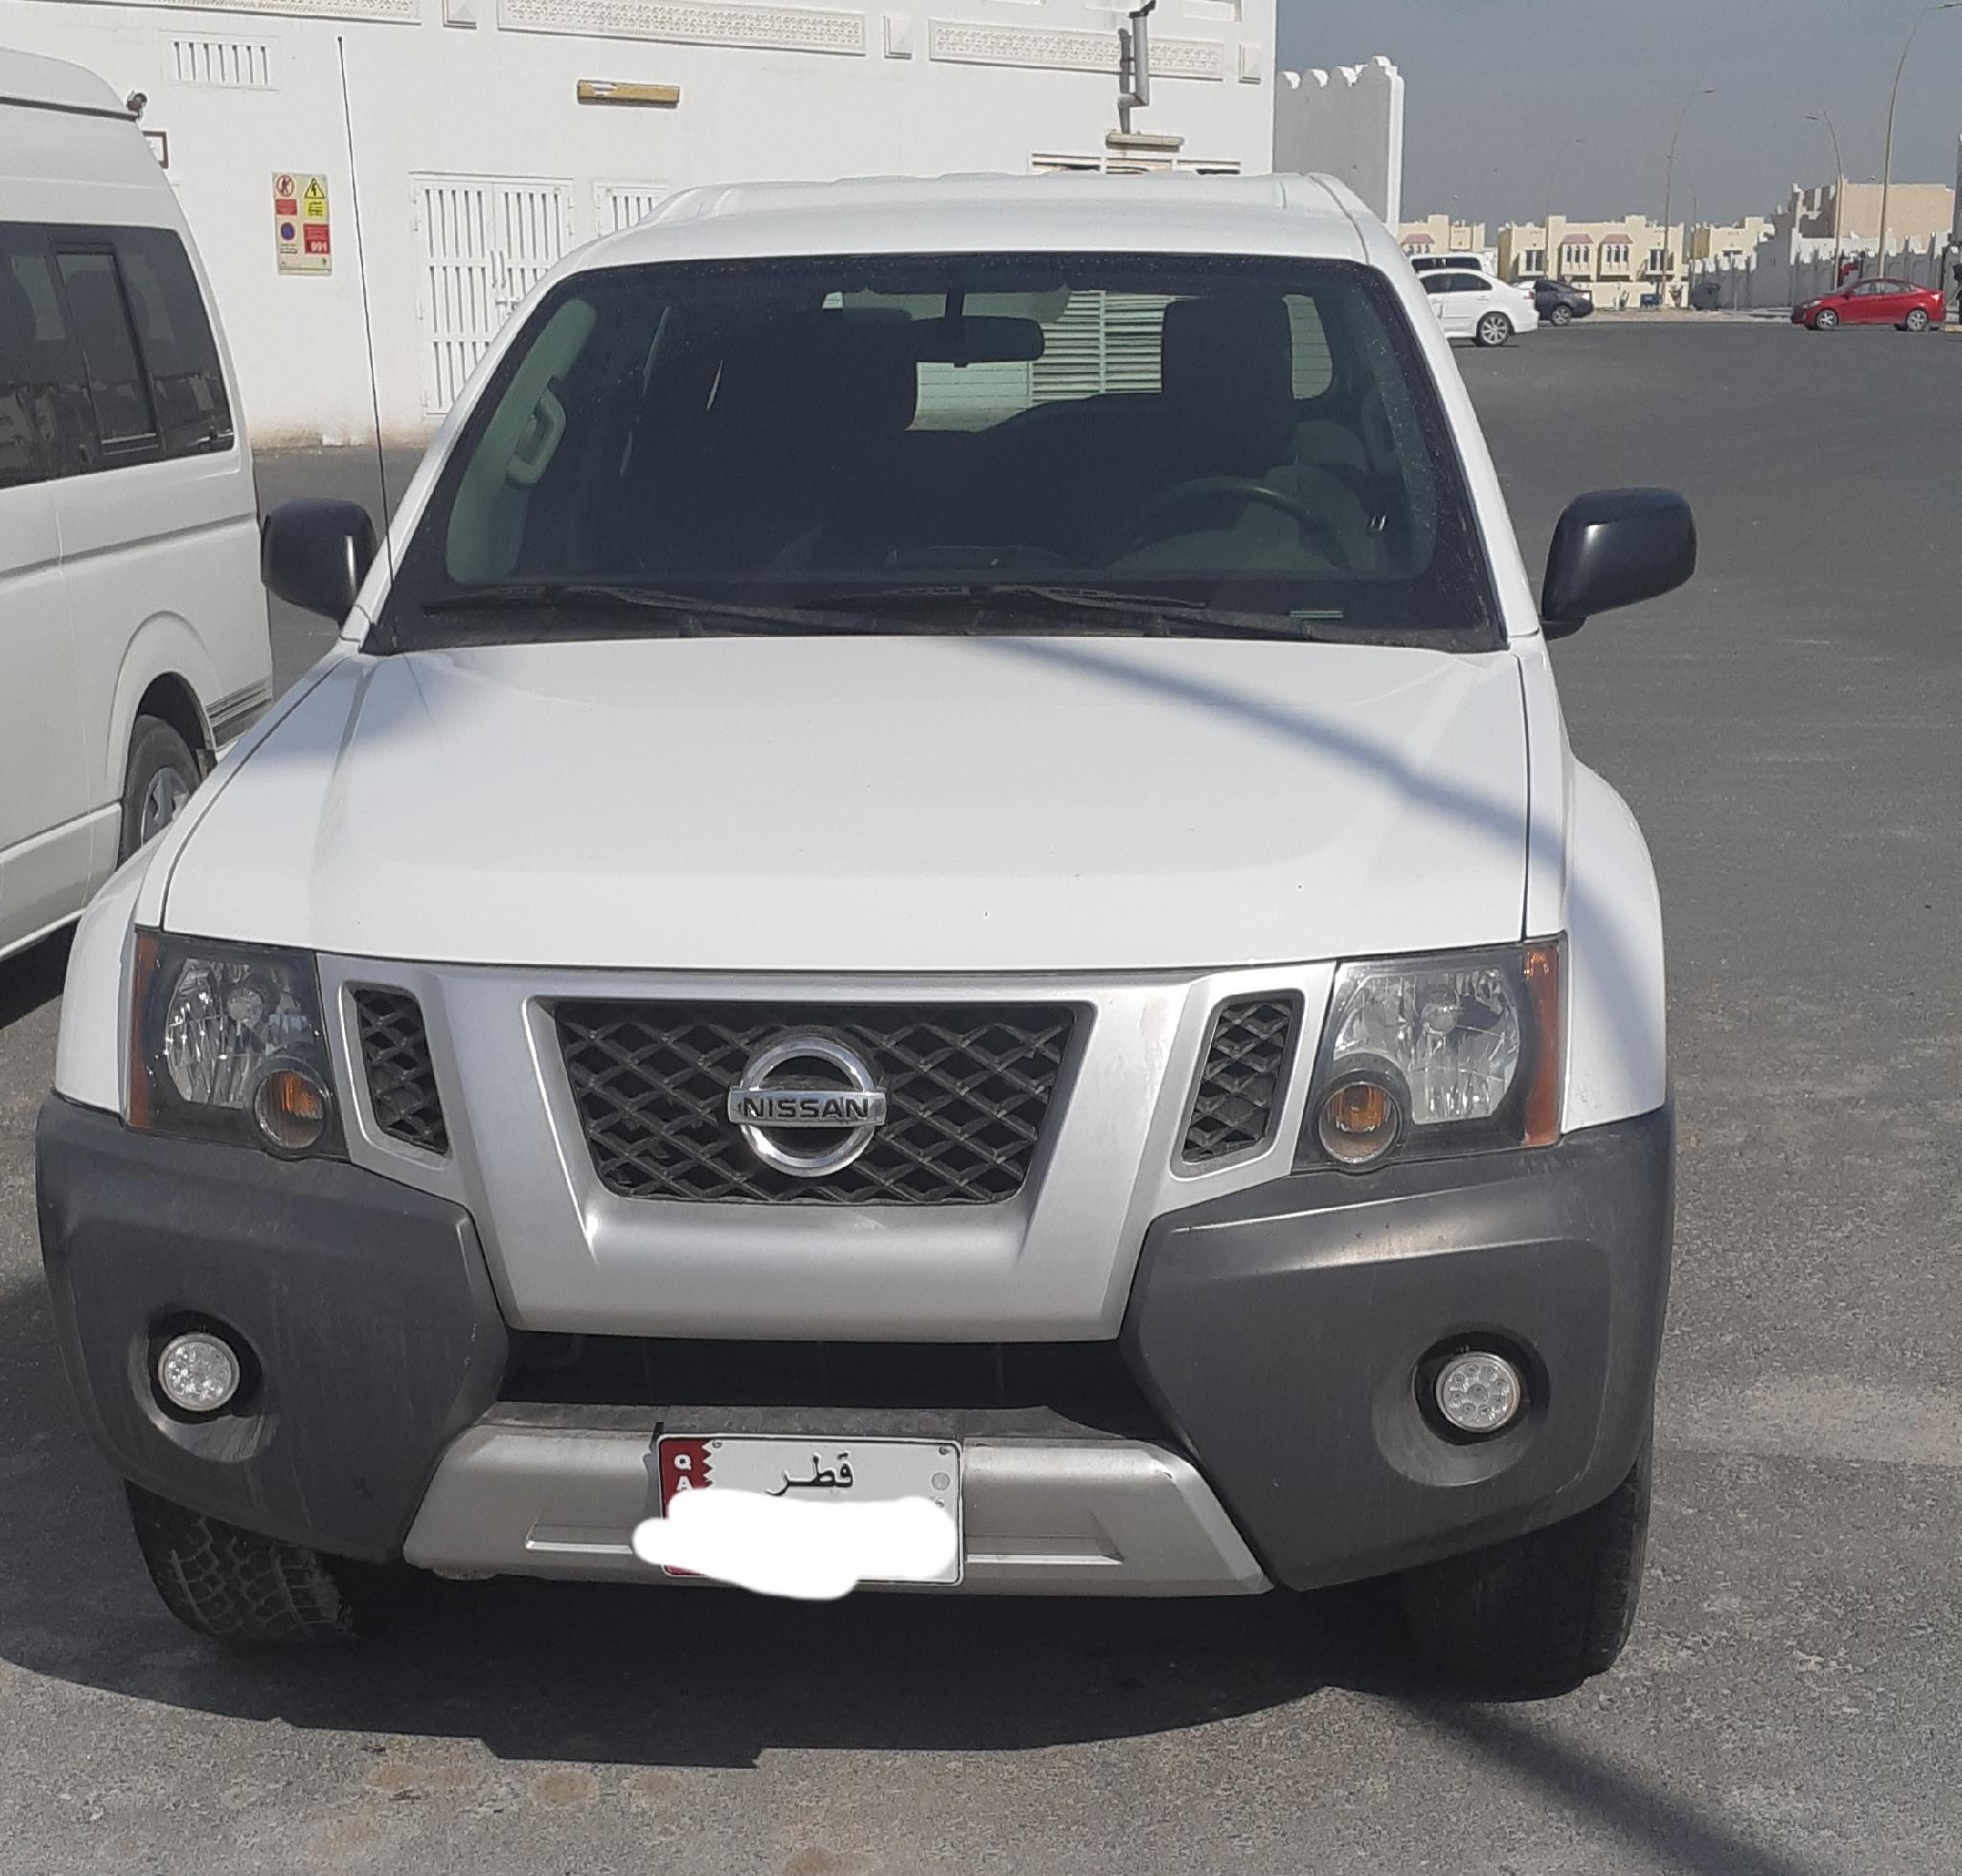 Nissan X Terra 2013 Qatar Living